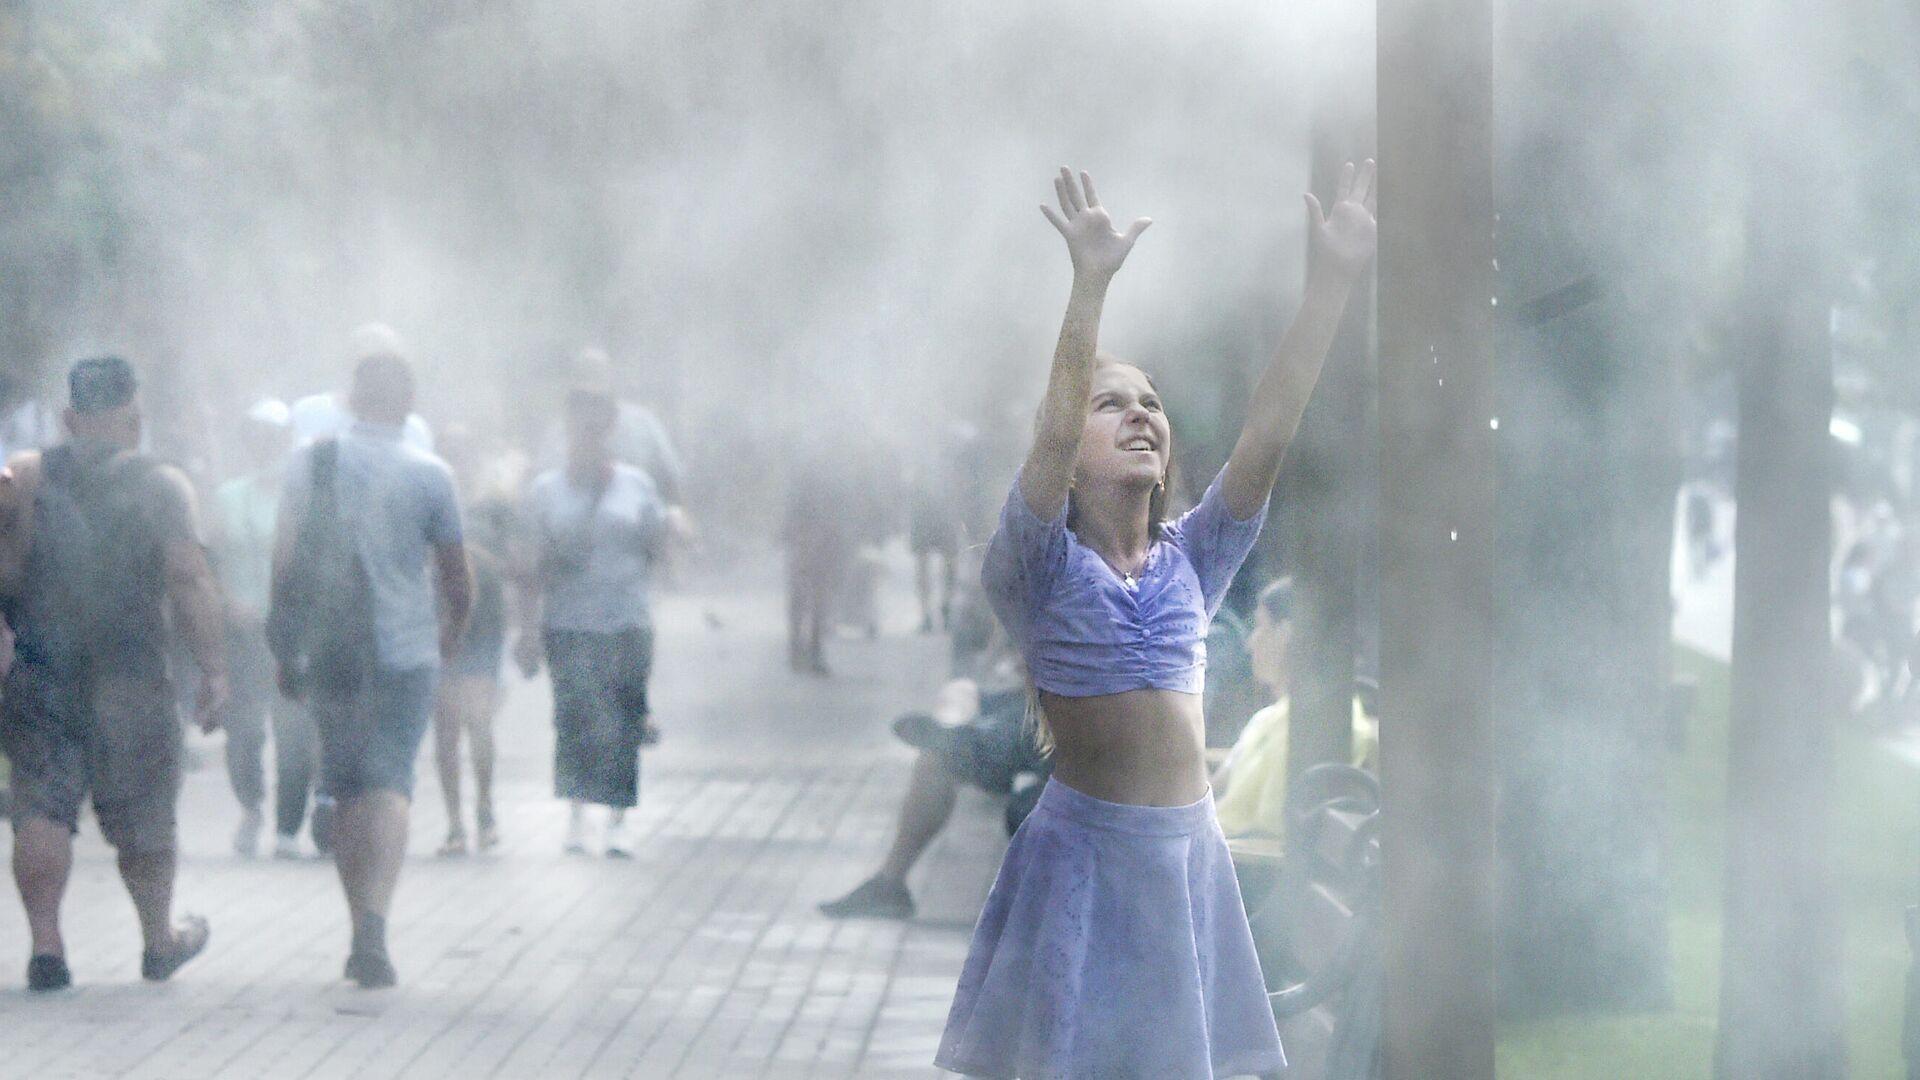 Девушка на улице Киева  - РИА Новости, 1920, 17.09.2021